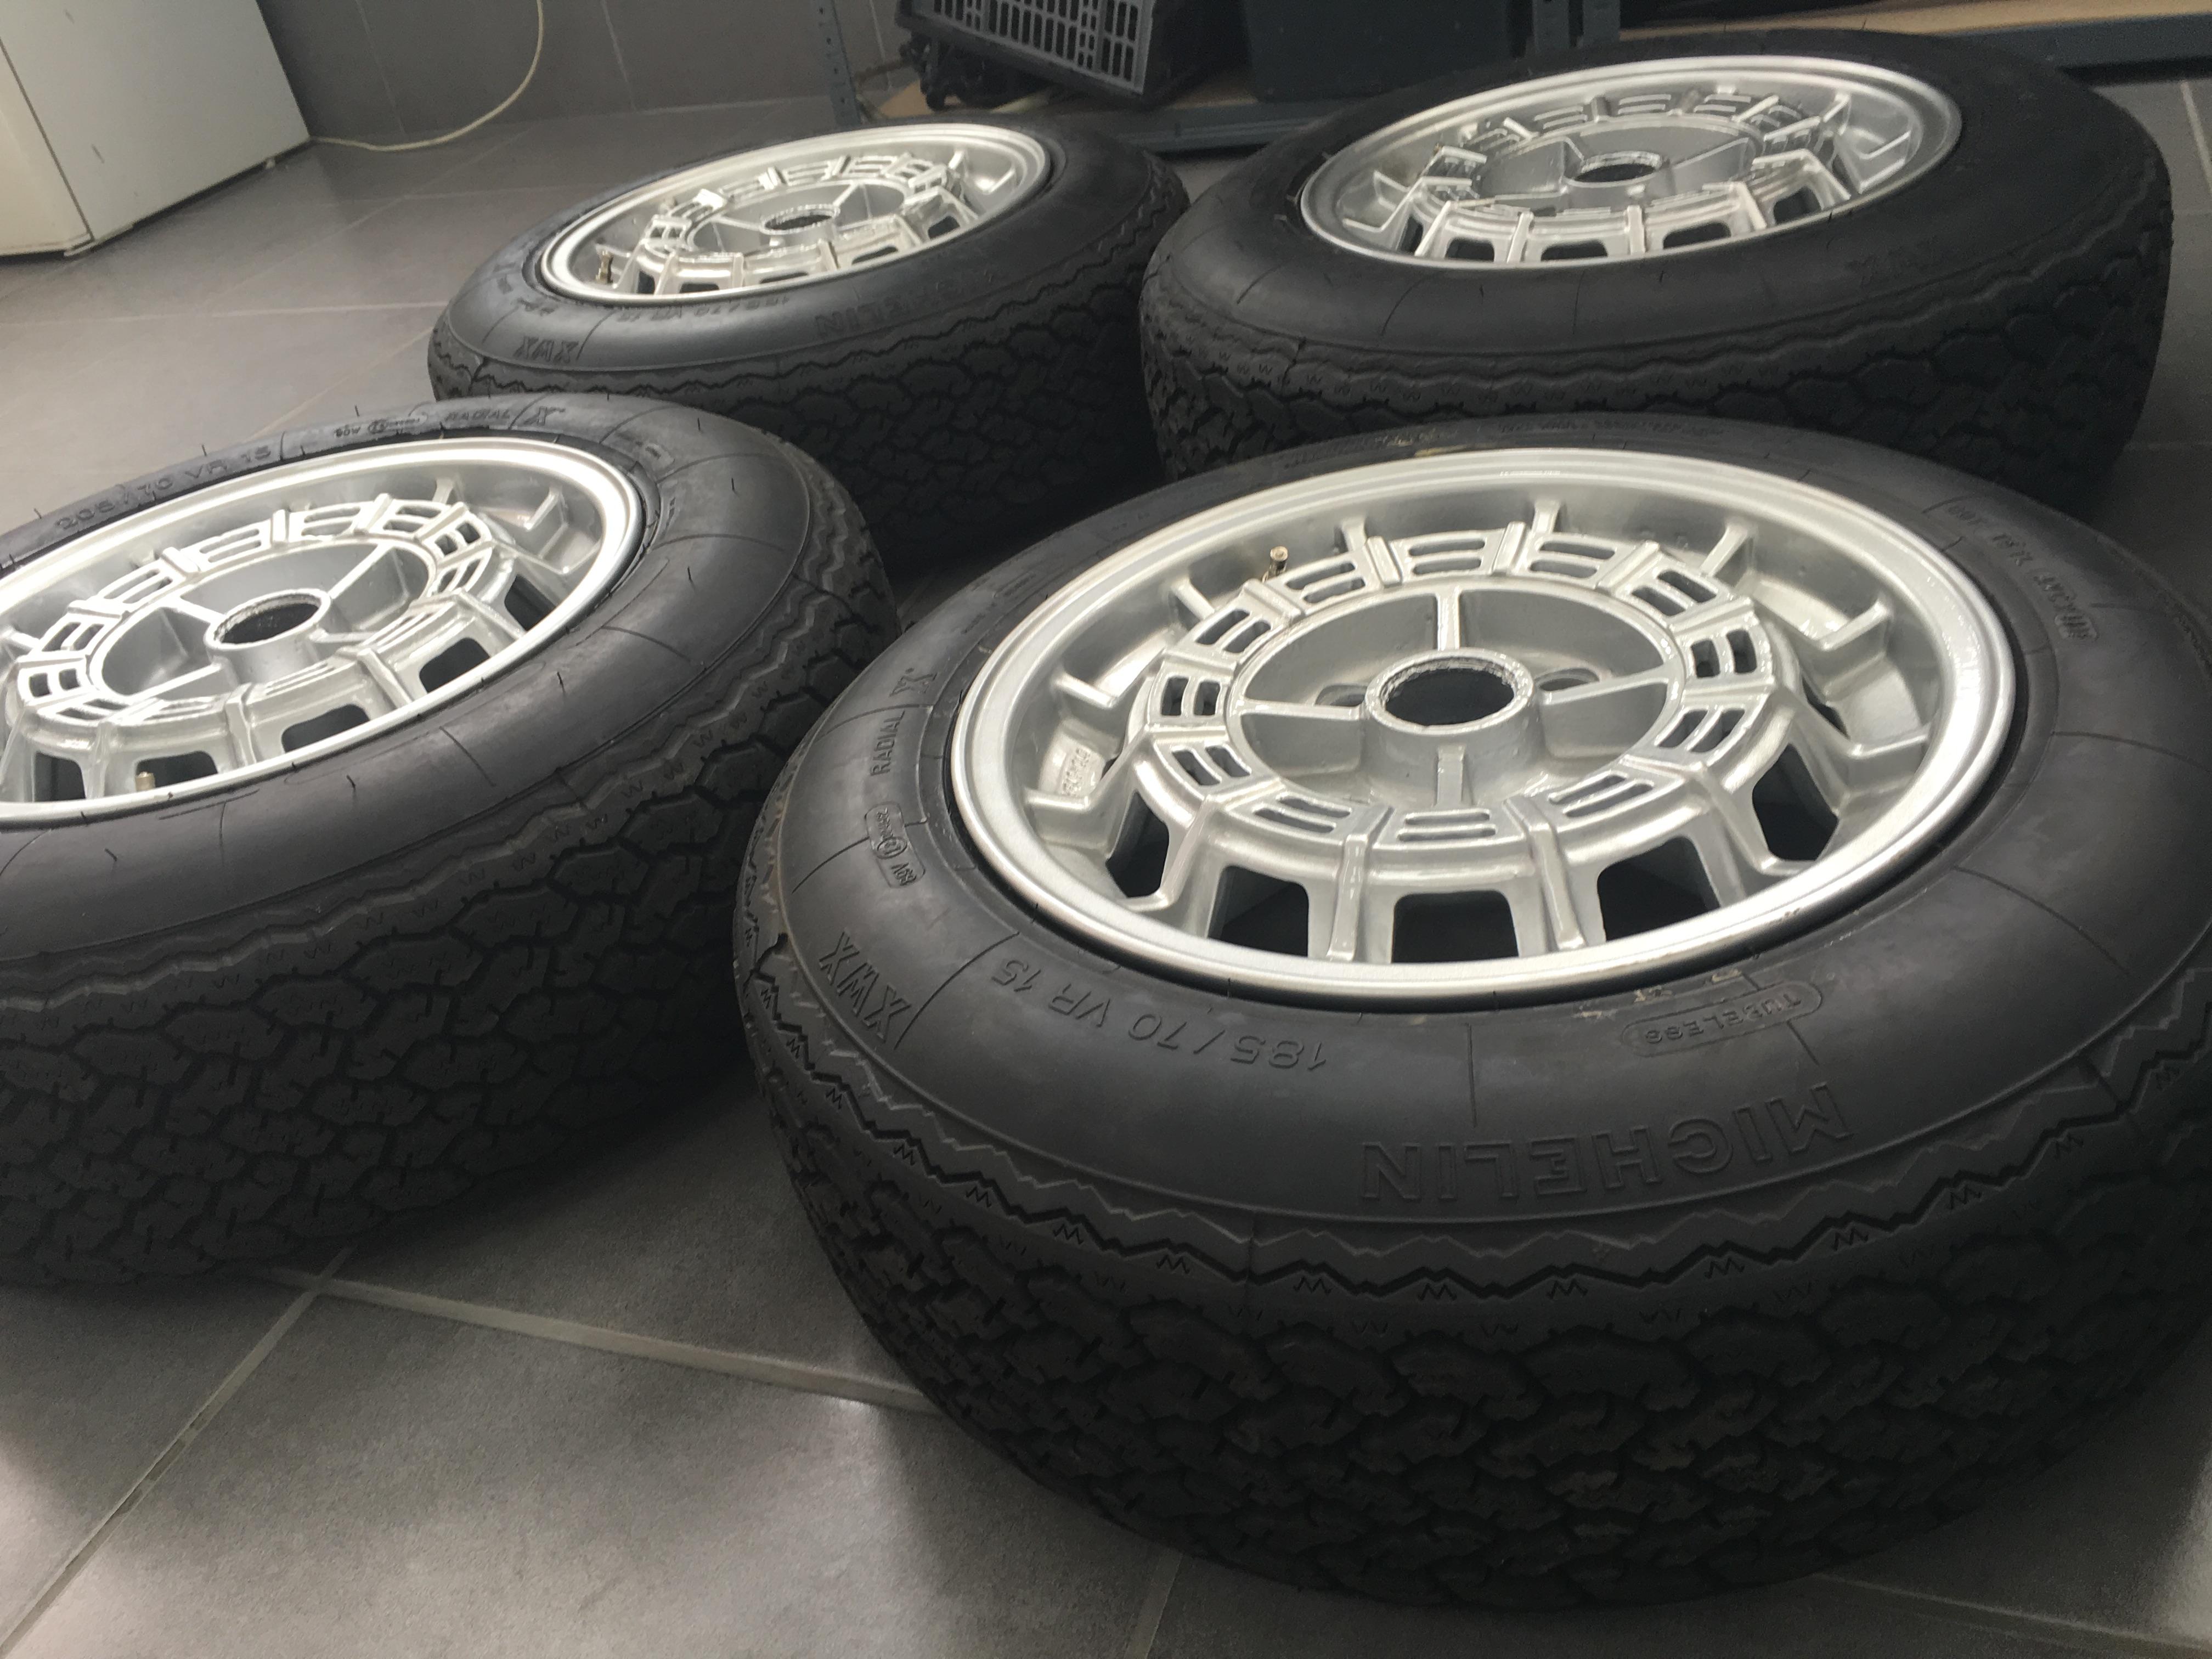 Maserati Merak Wheels and Tyres